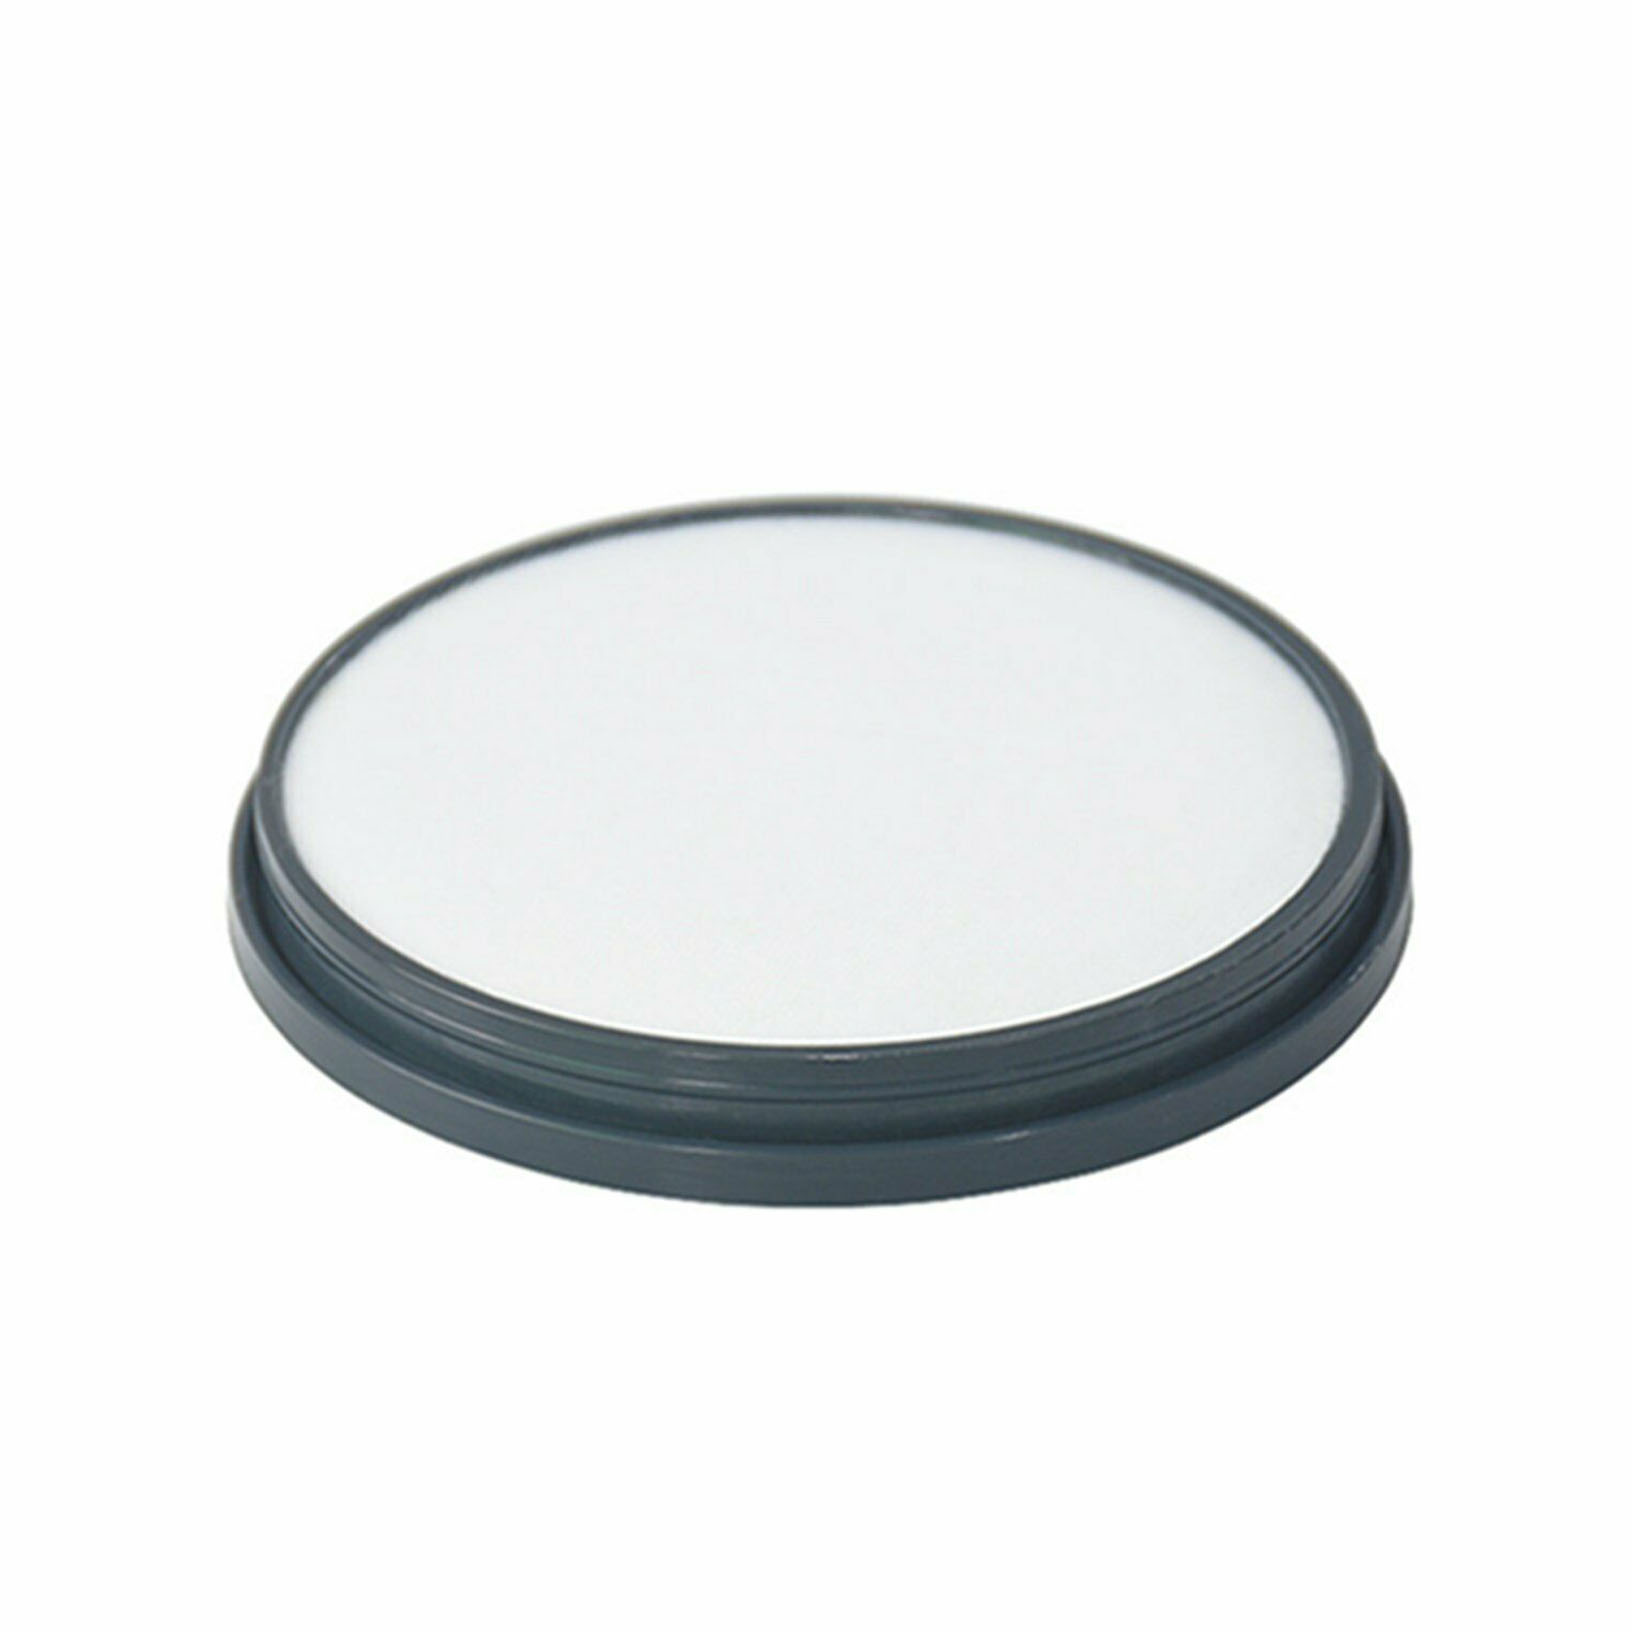 Pre/&Post HEPA Filter Set for Rowenta RO3715 RO3795 RO3798 Vacuum Cleaner Parts